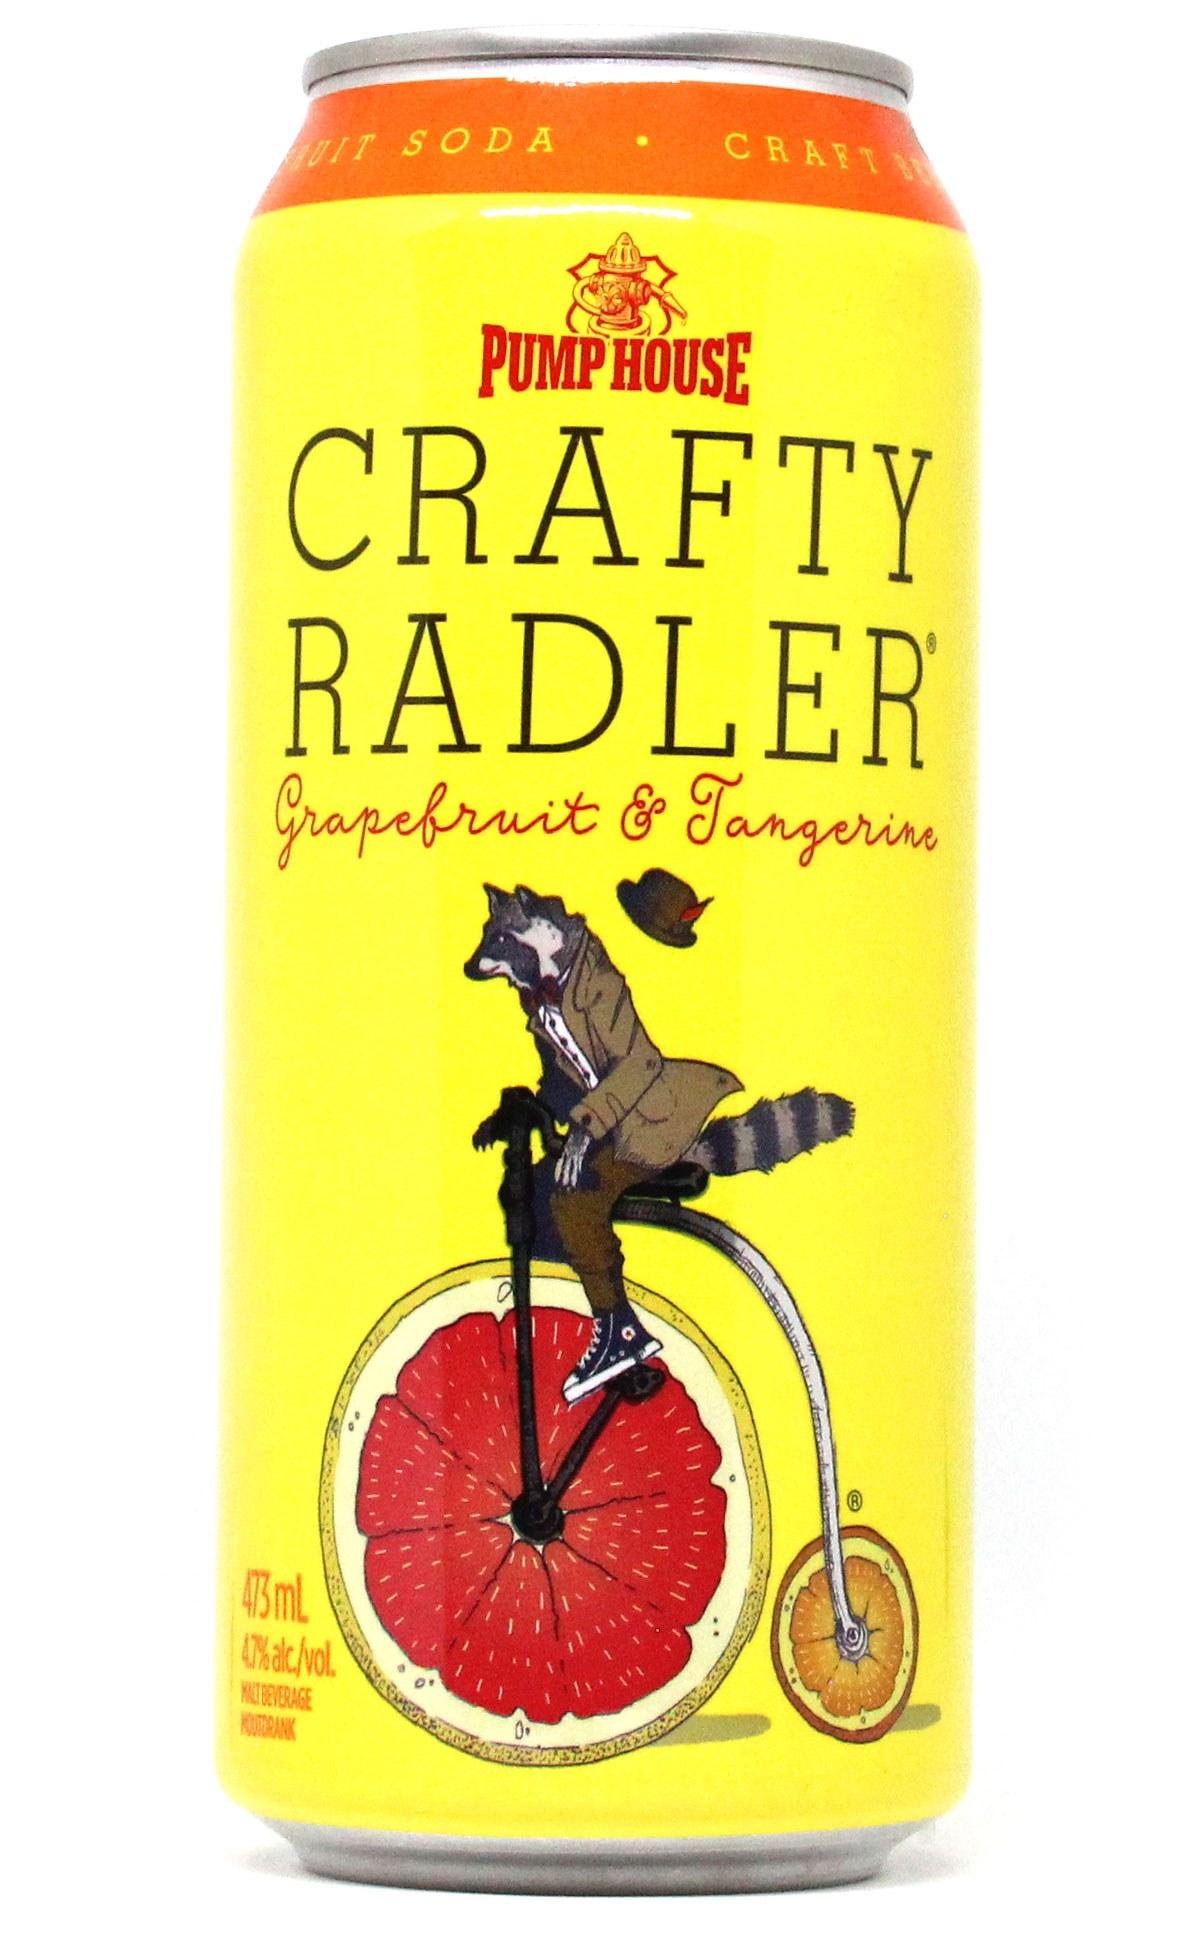 Crafty Radler